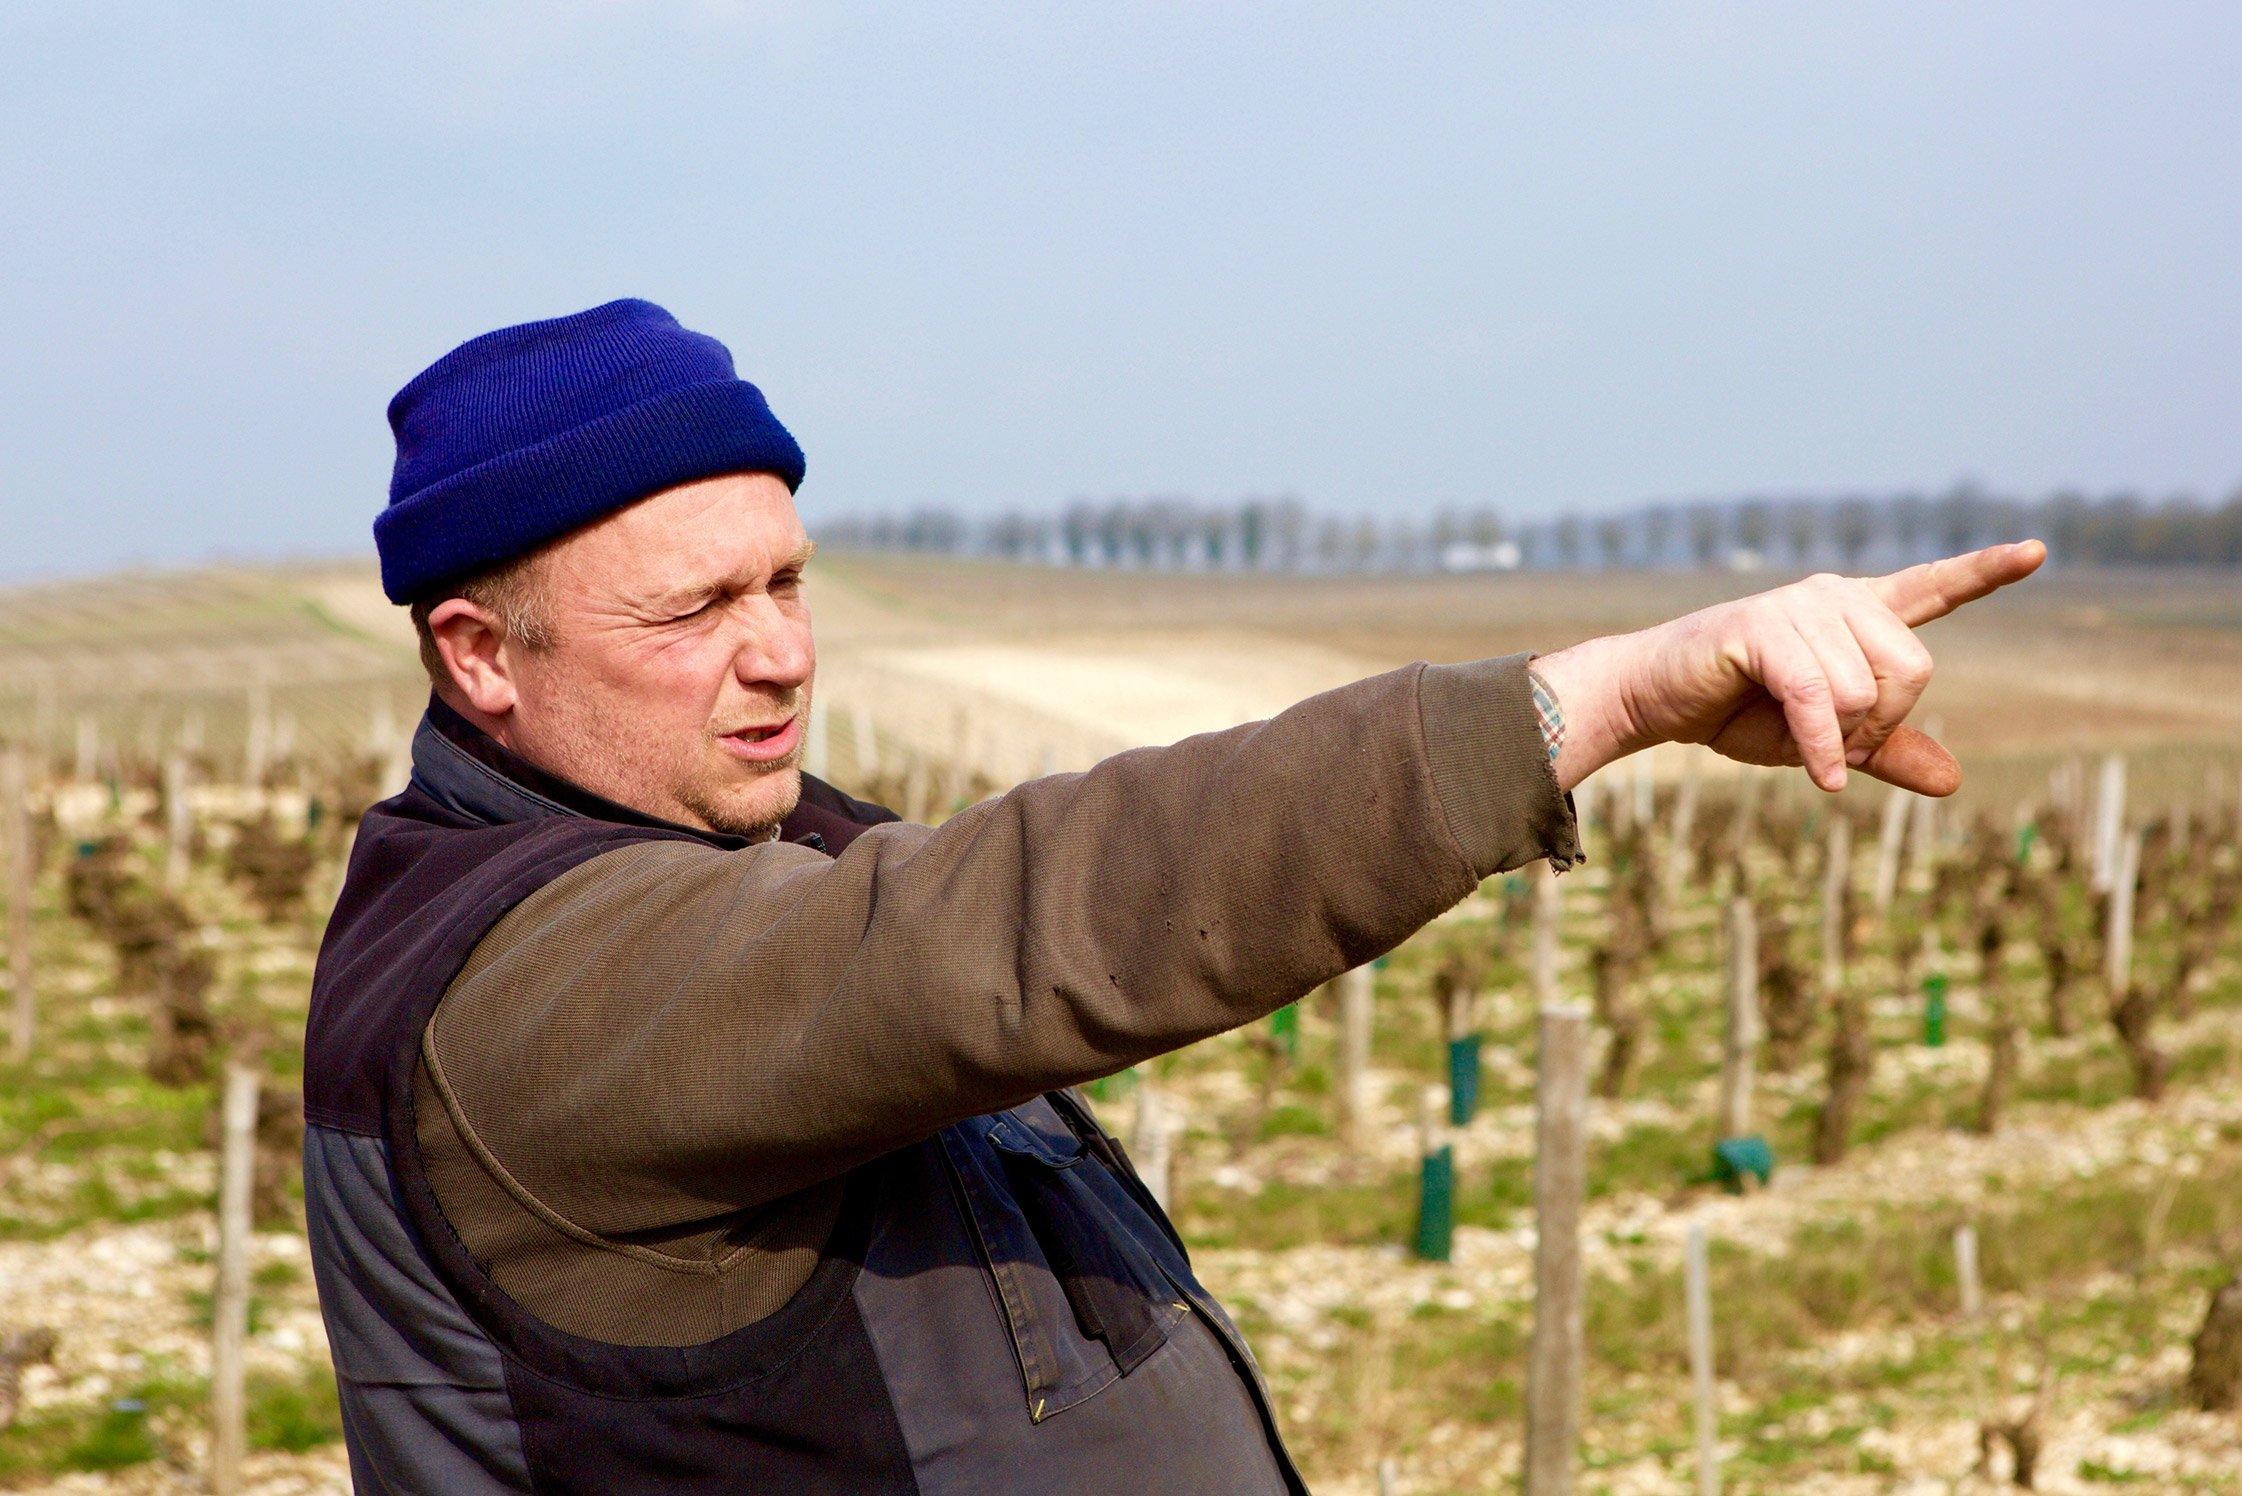 François Crochet, winemaker from Sancerre, Loire Valley